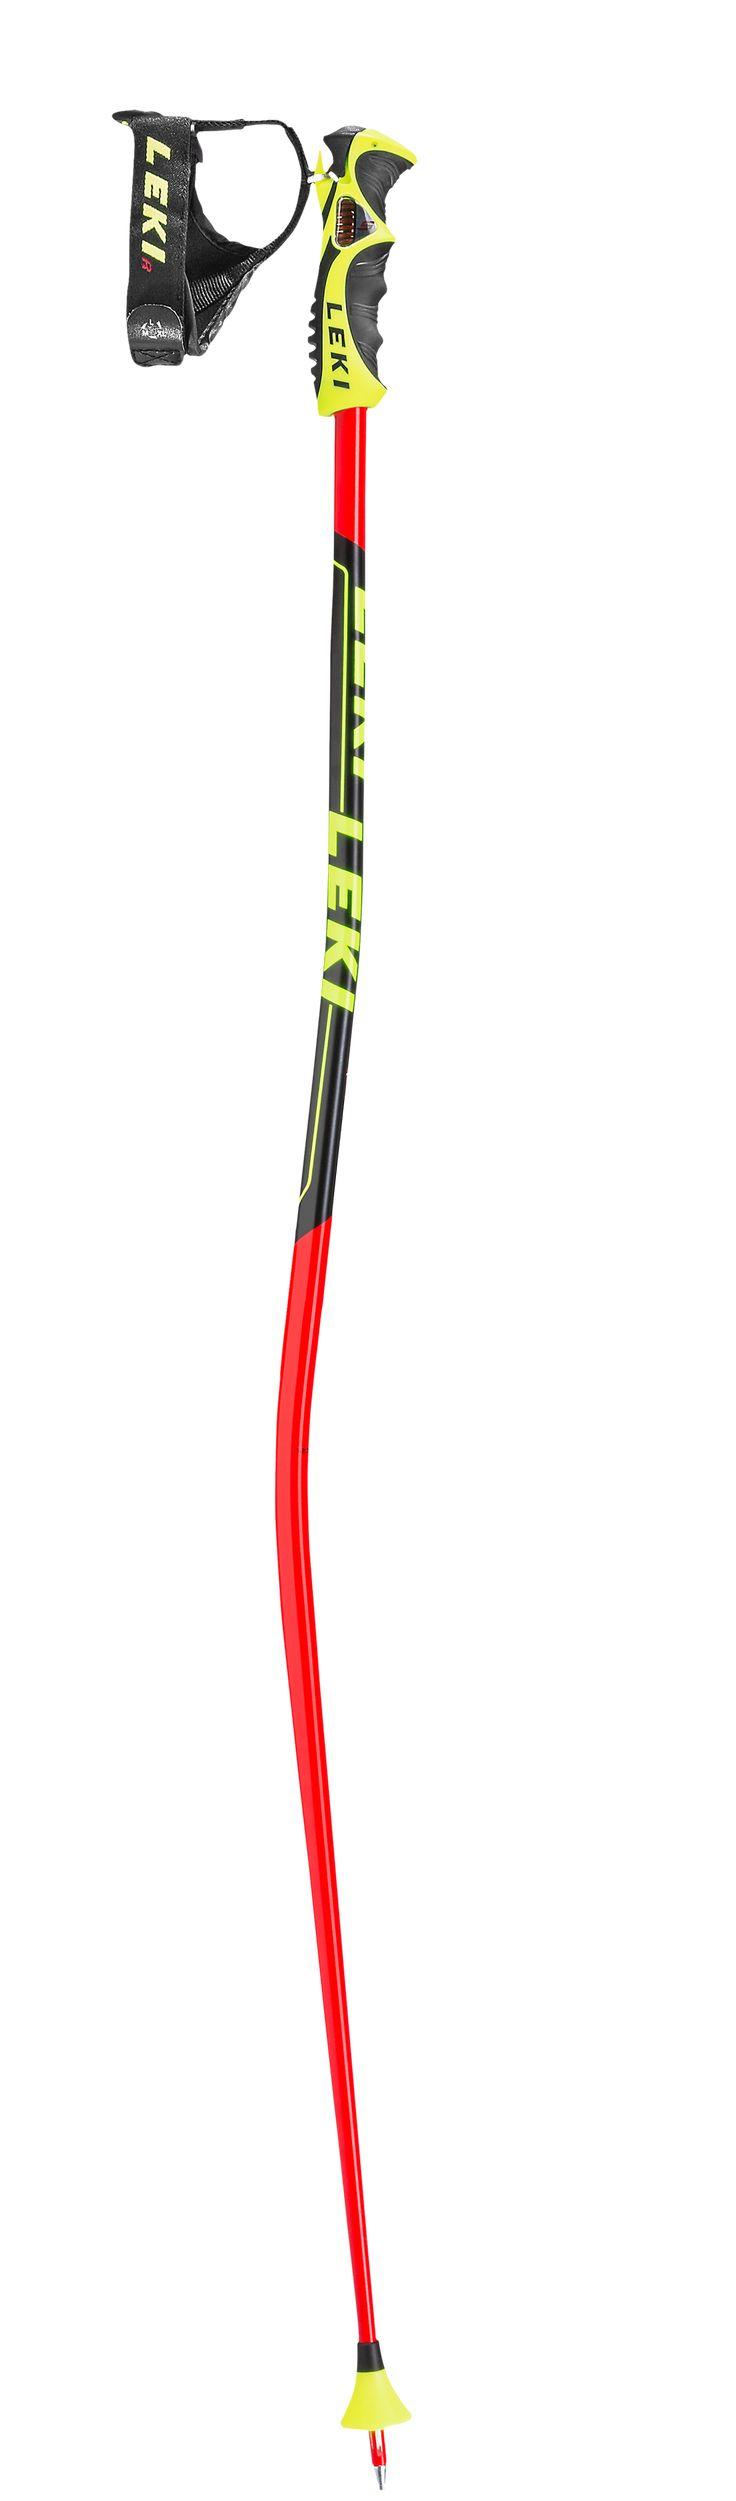 Worldcup Racing GS TBS   Stöcke   Ski Alpin   Produktwelten   LEKI